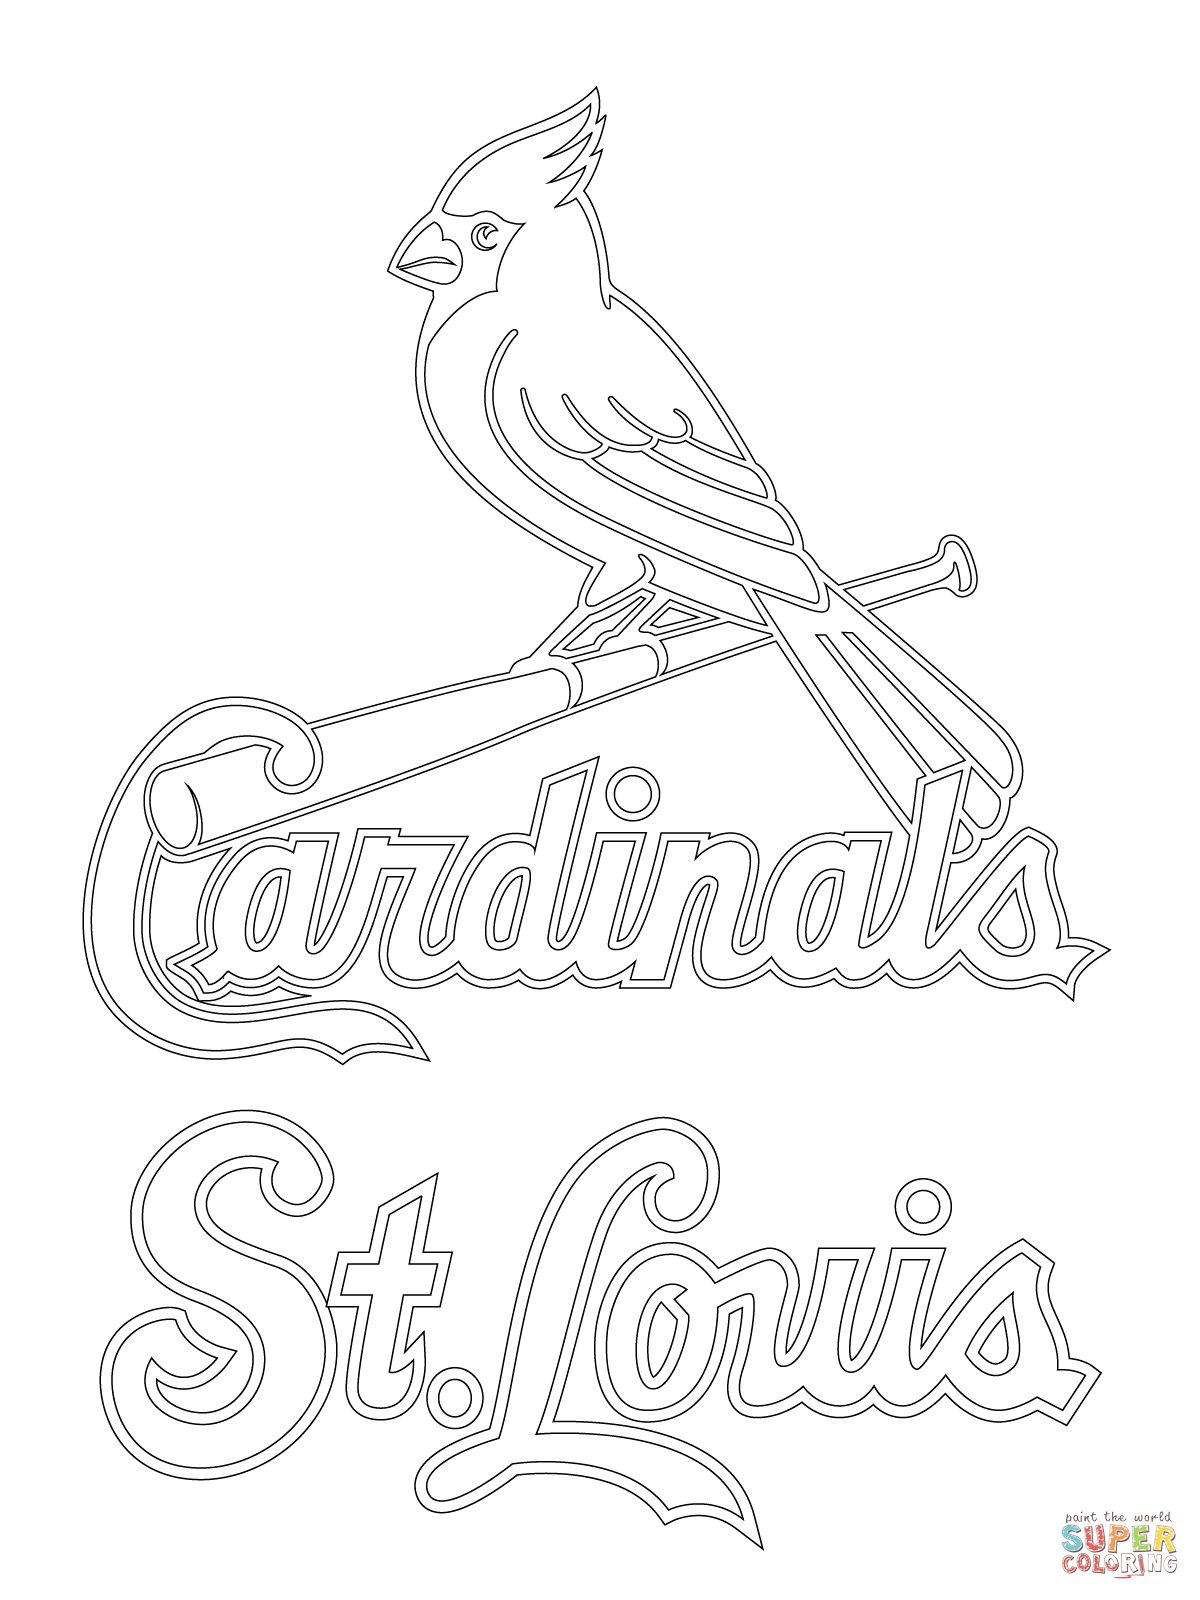 St Louis Cardinals Logo Coloring Page Supercoloring Diy